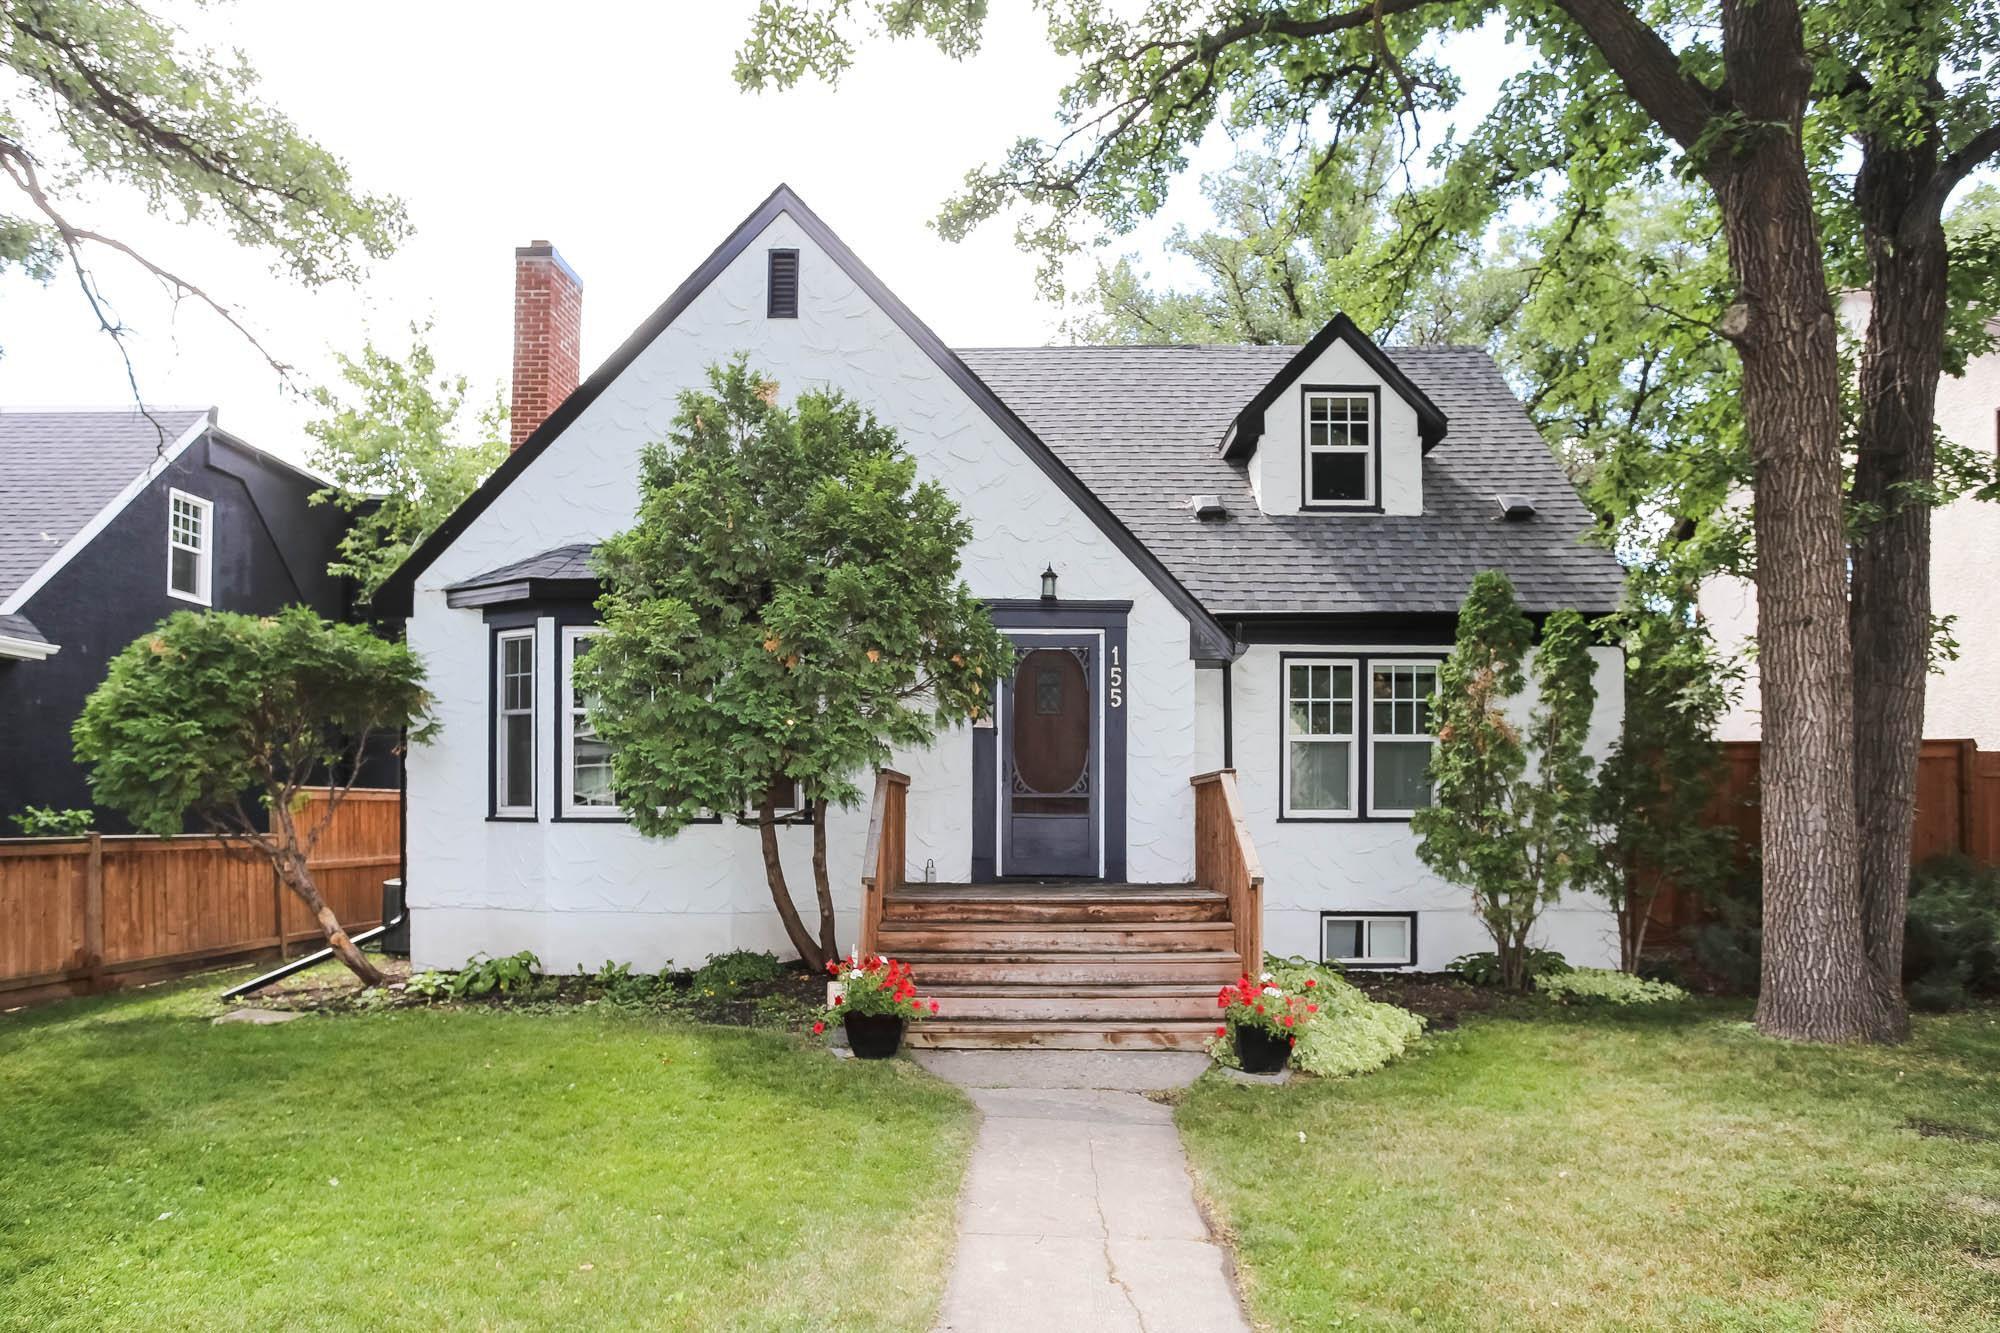 Photo 34: Photos: 155 Borebank Street in Winnipeg: River Heights Single Family Detached for sale (1C)  : MLS®# 202017166